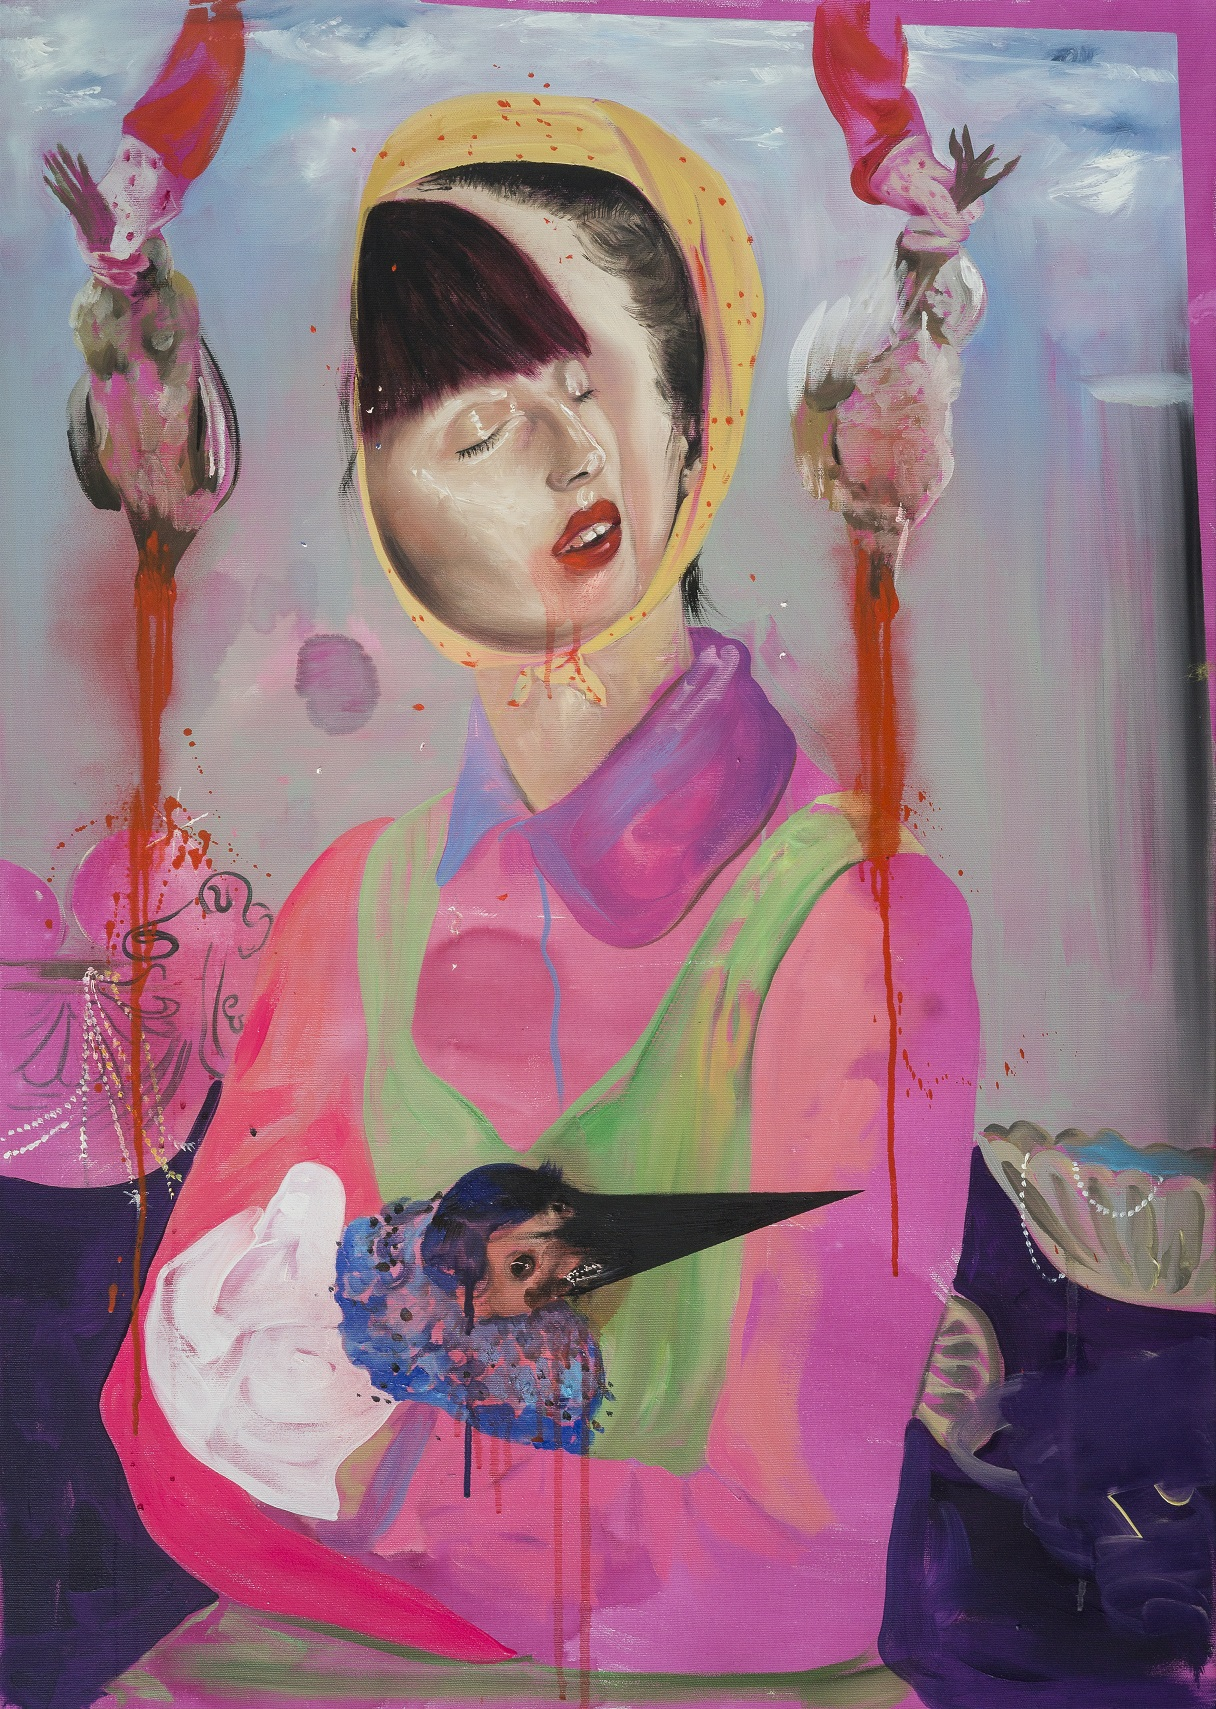 Malarstwo Aleksandry Urban